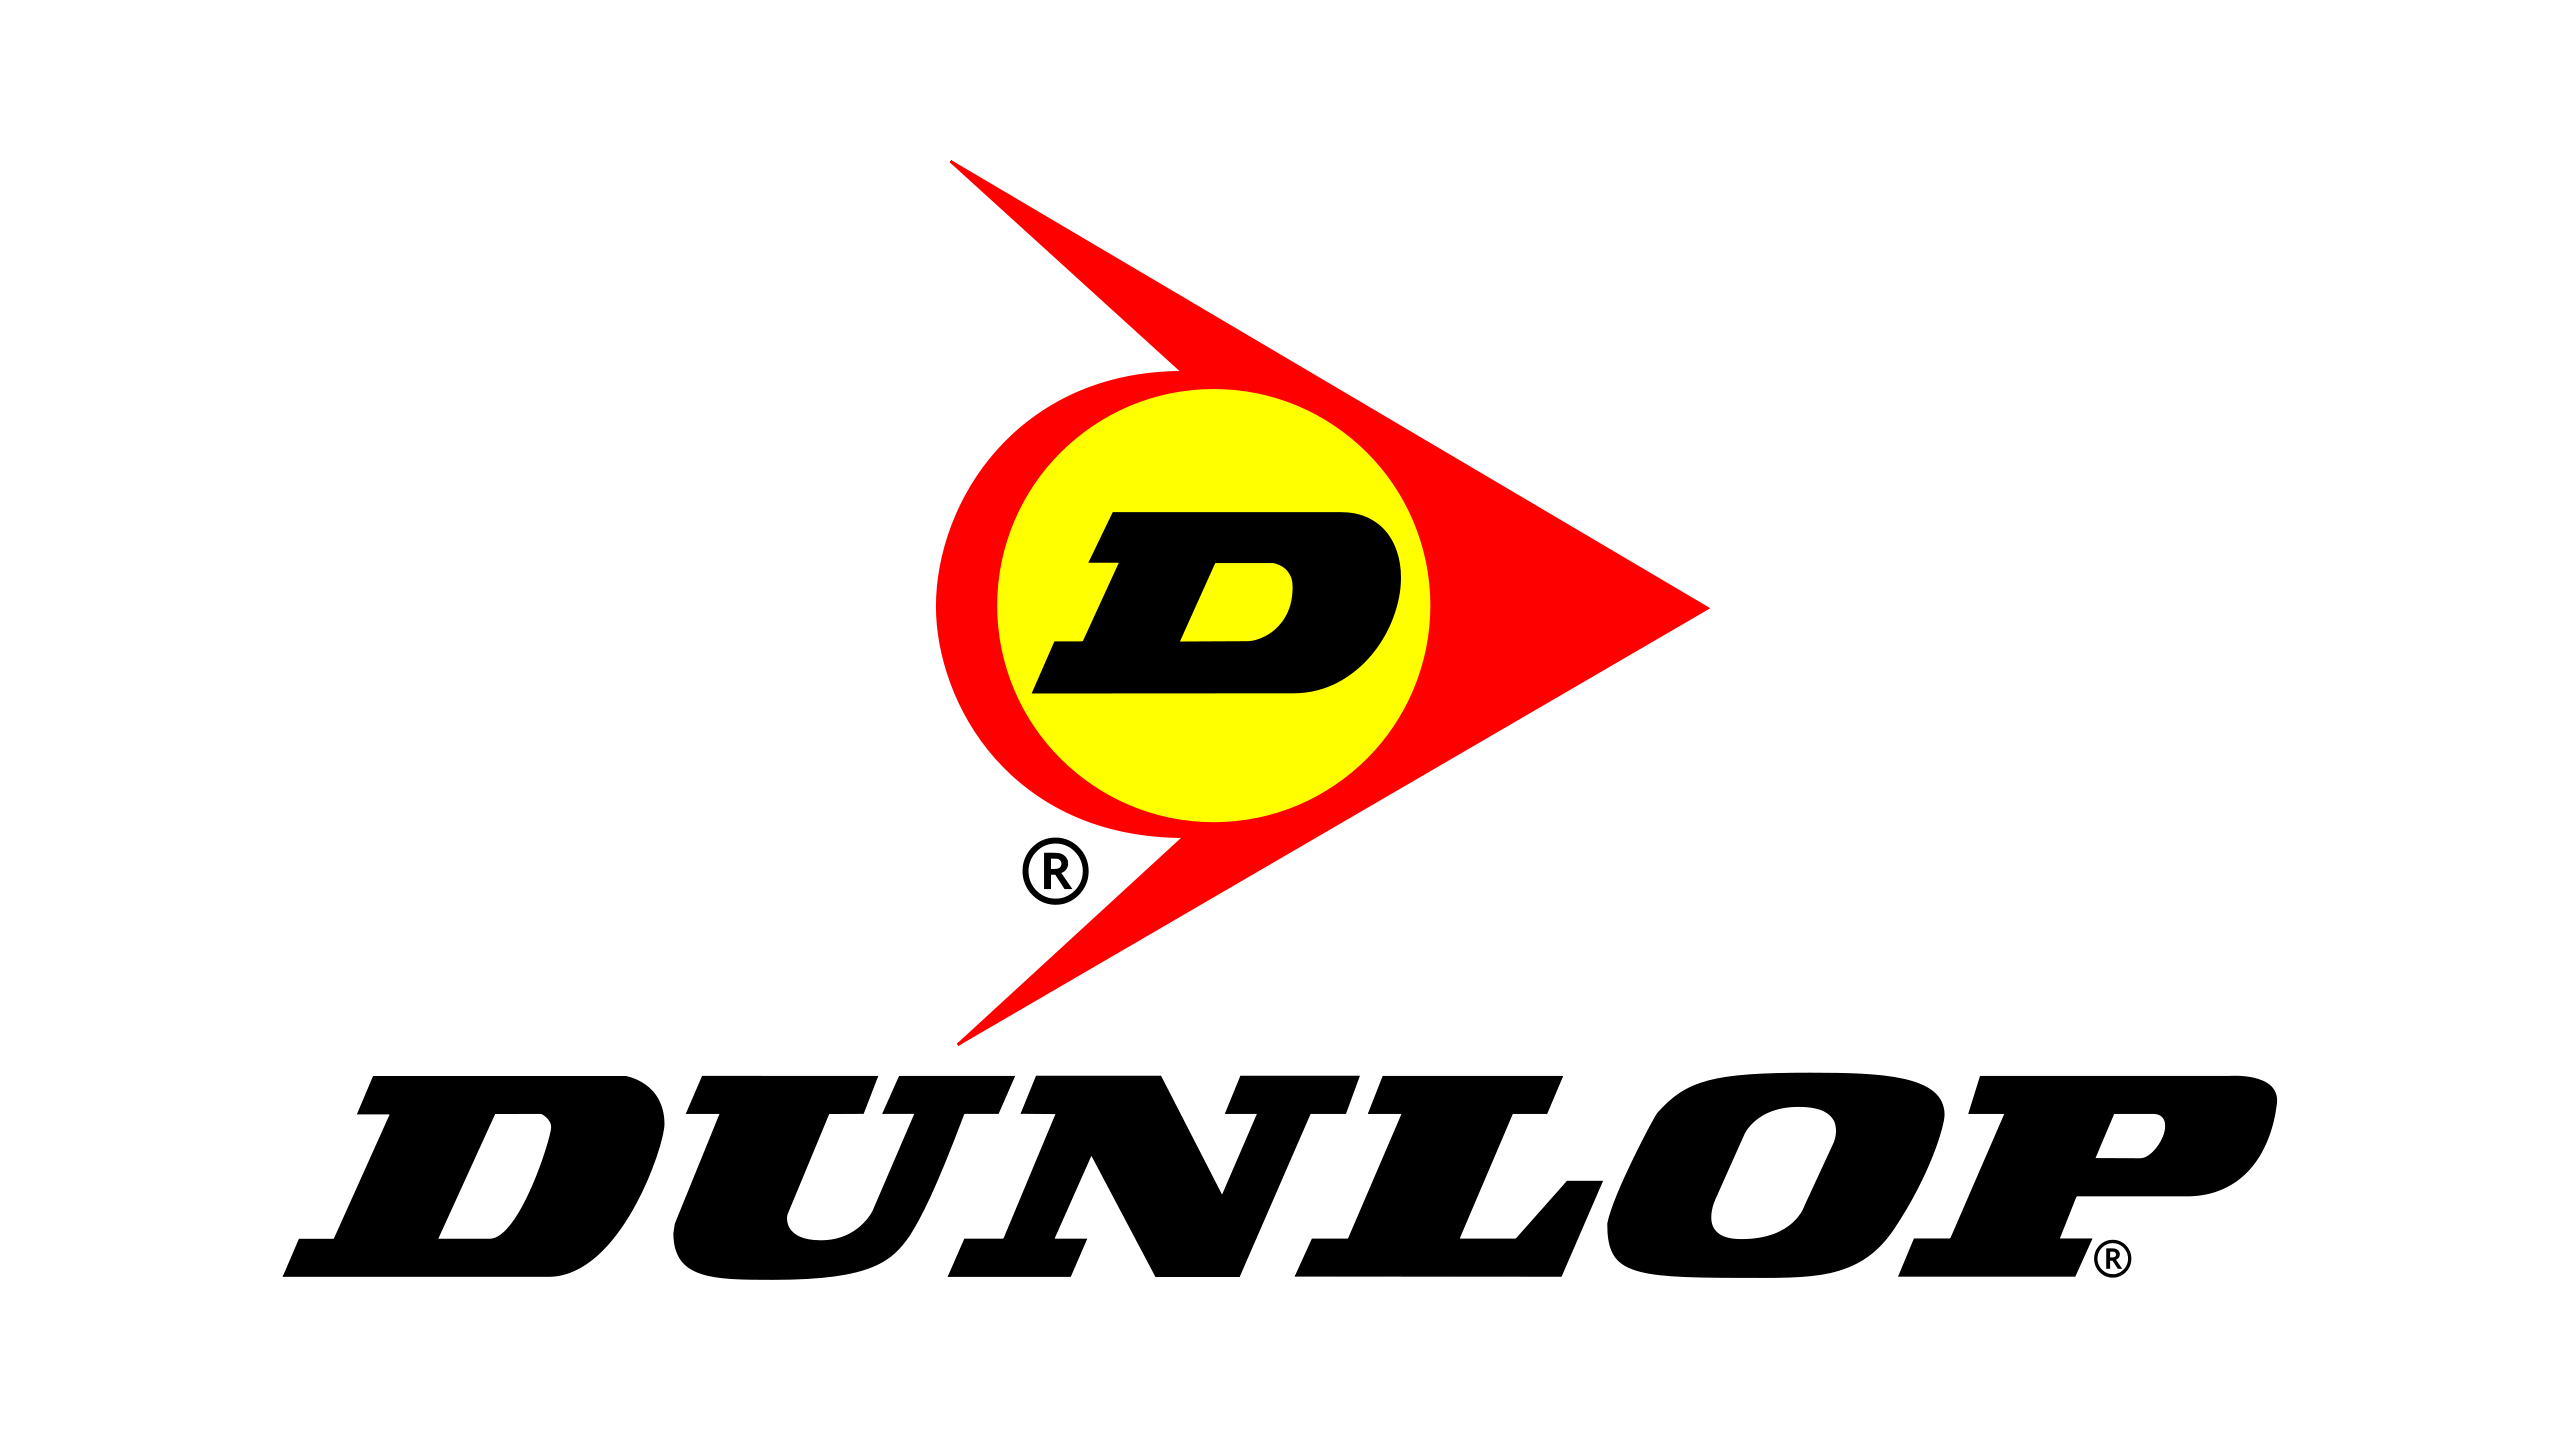 Dunlop-logo-2560x1440